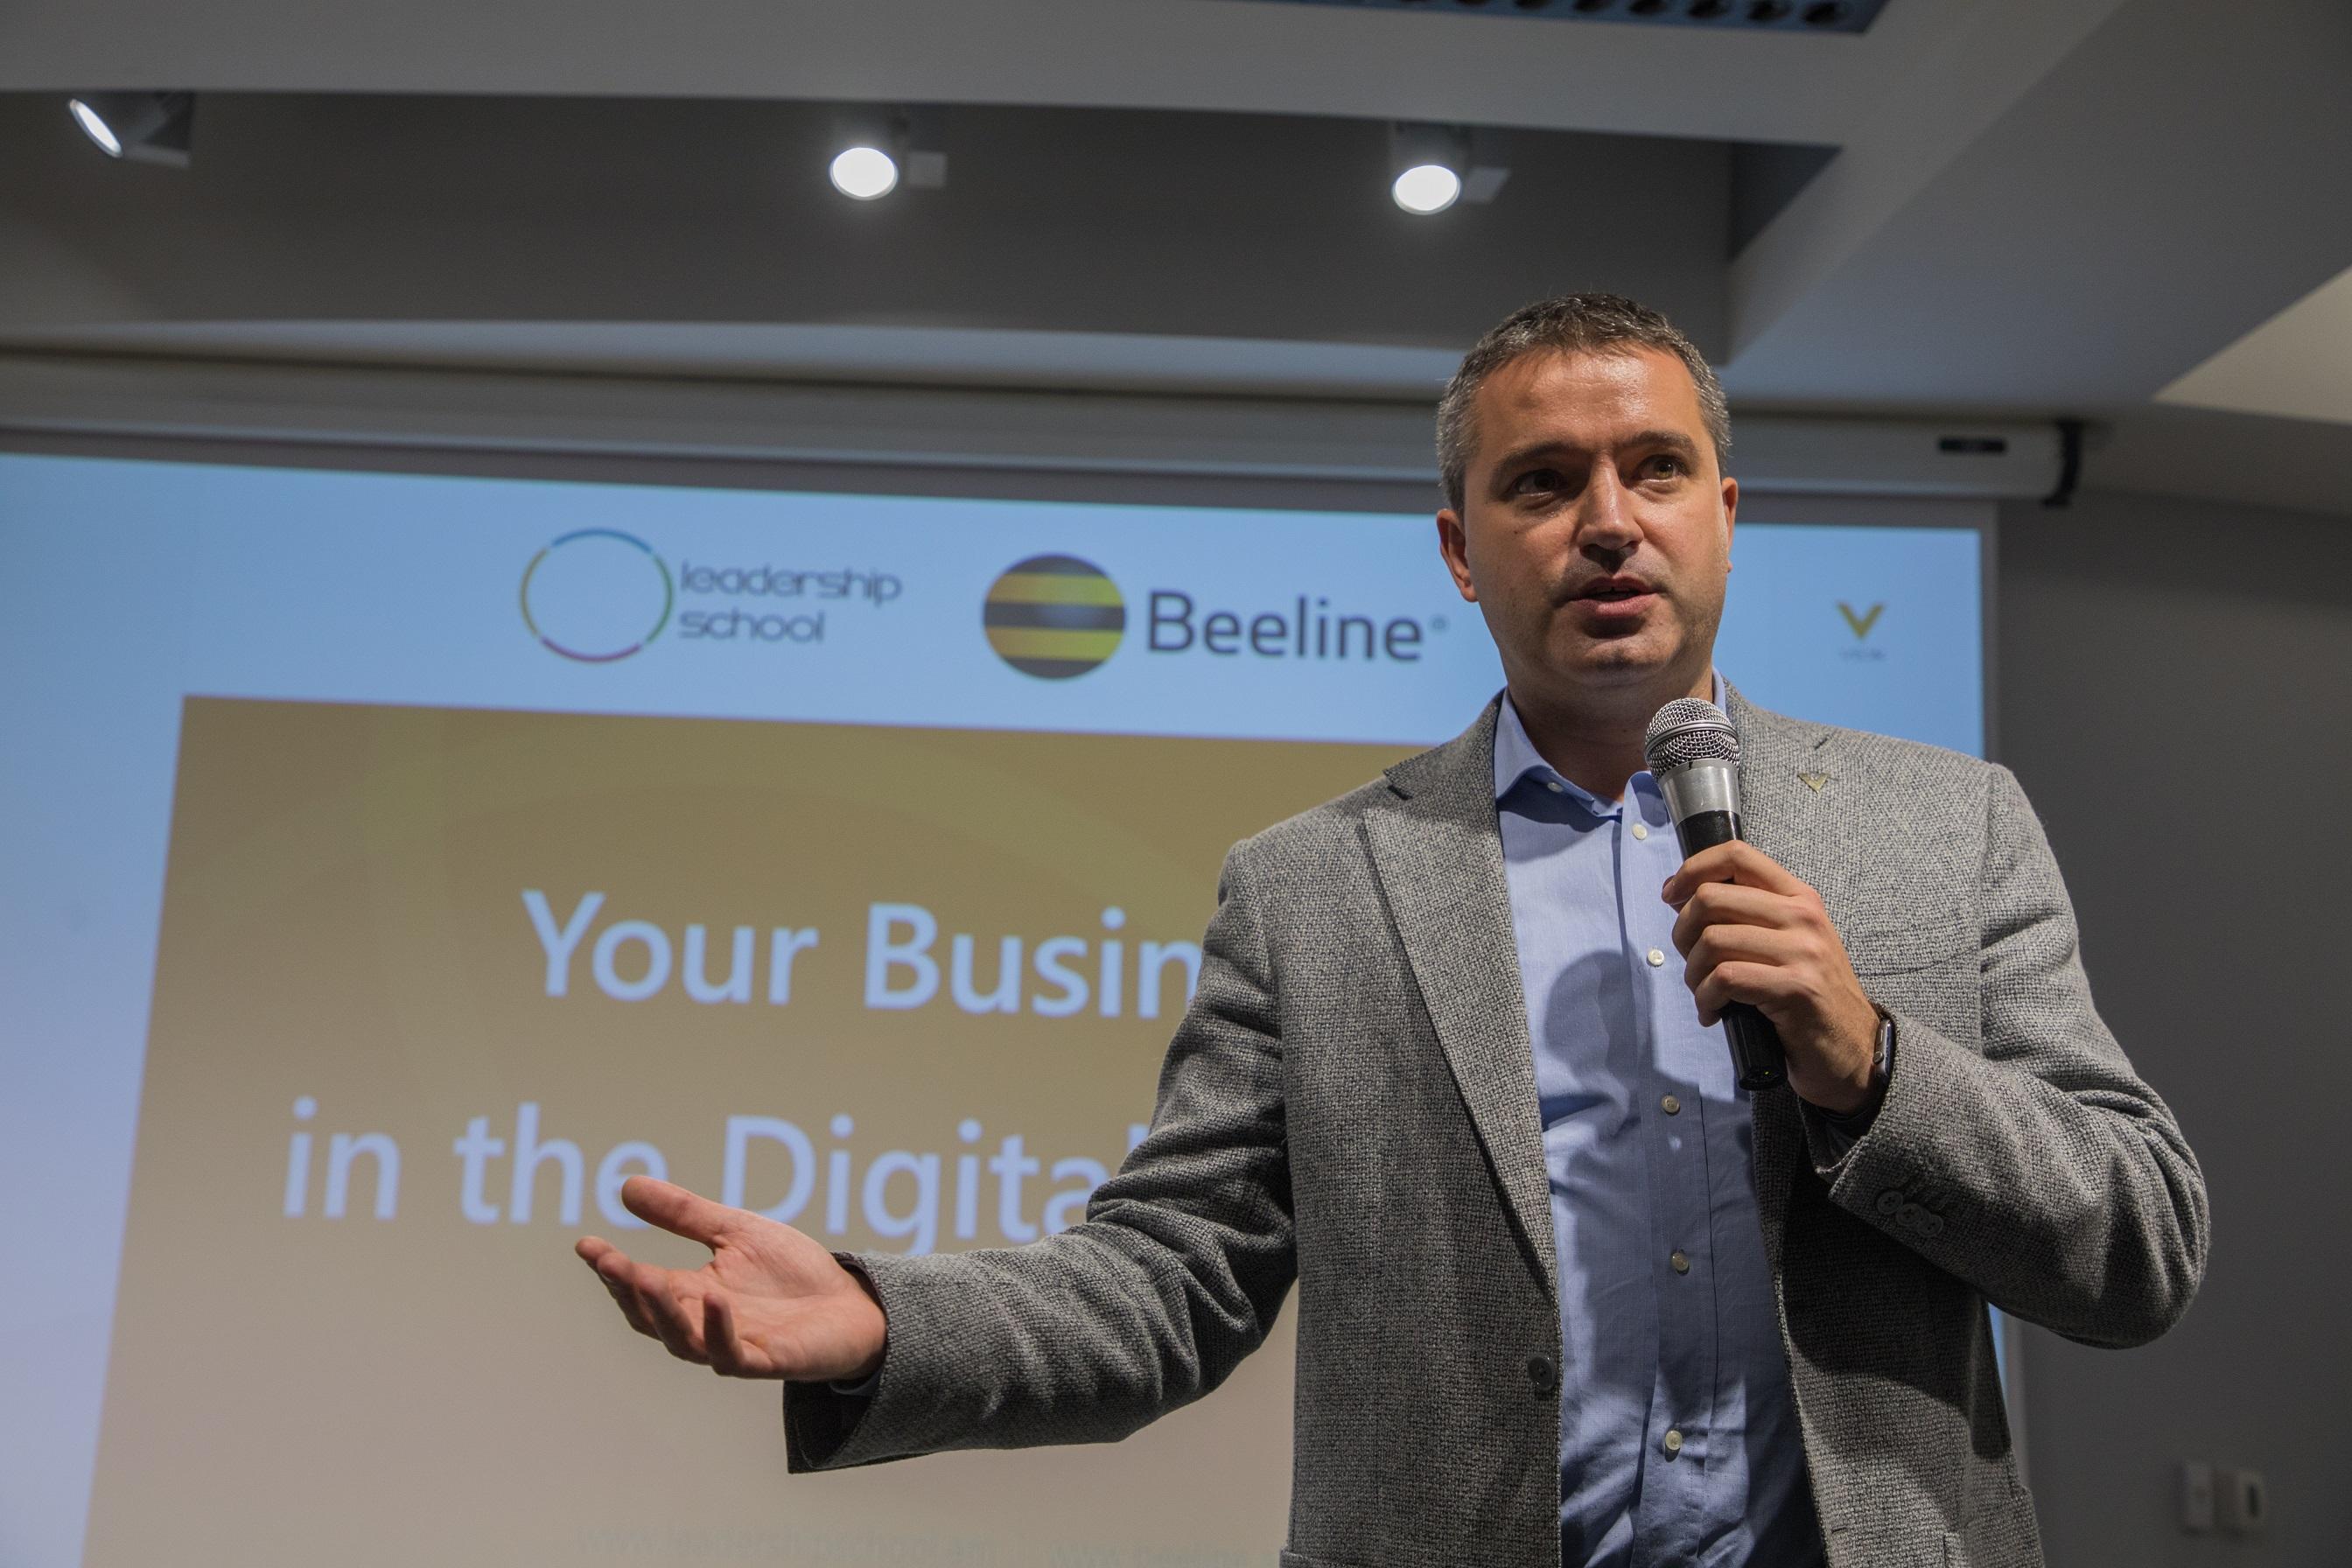 Beeline: Андрей Пятахин прочитал лекцию по теме «Бизнес в цифровом будущем»